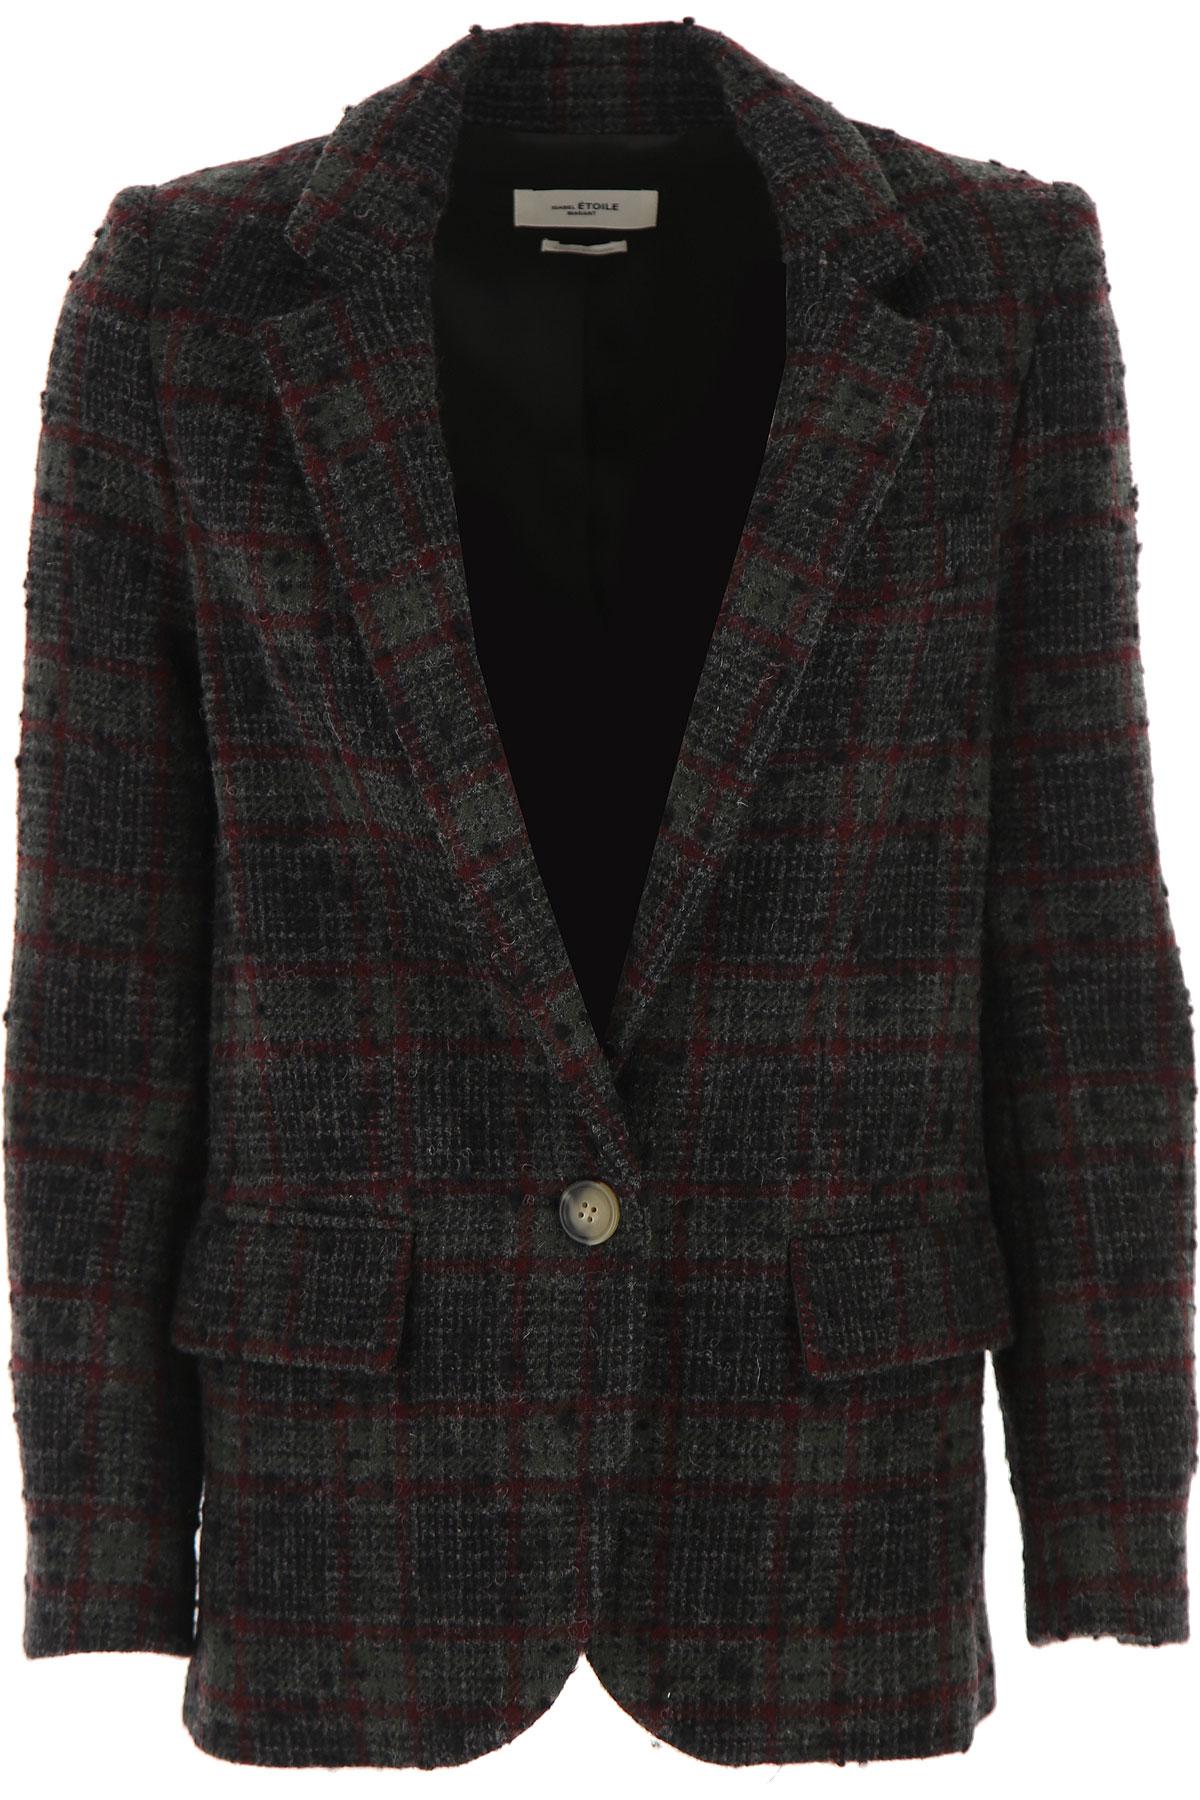 Isabel Marant Blazer for Women On Sale, Dark Grey, Wool, 2019, 4 8